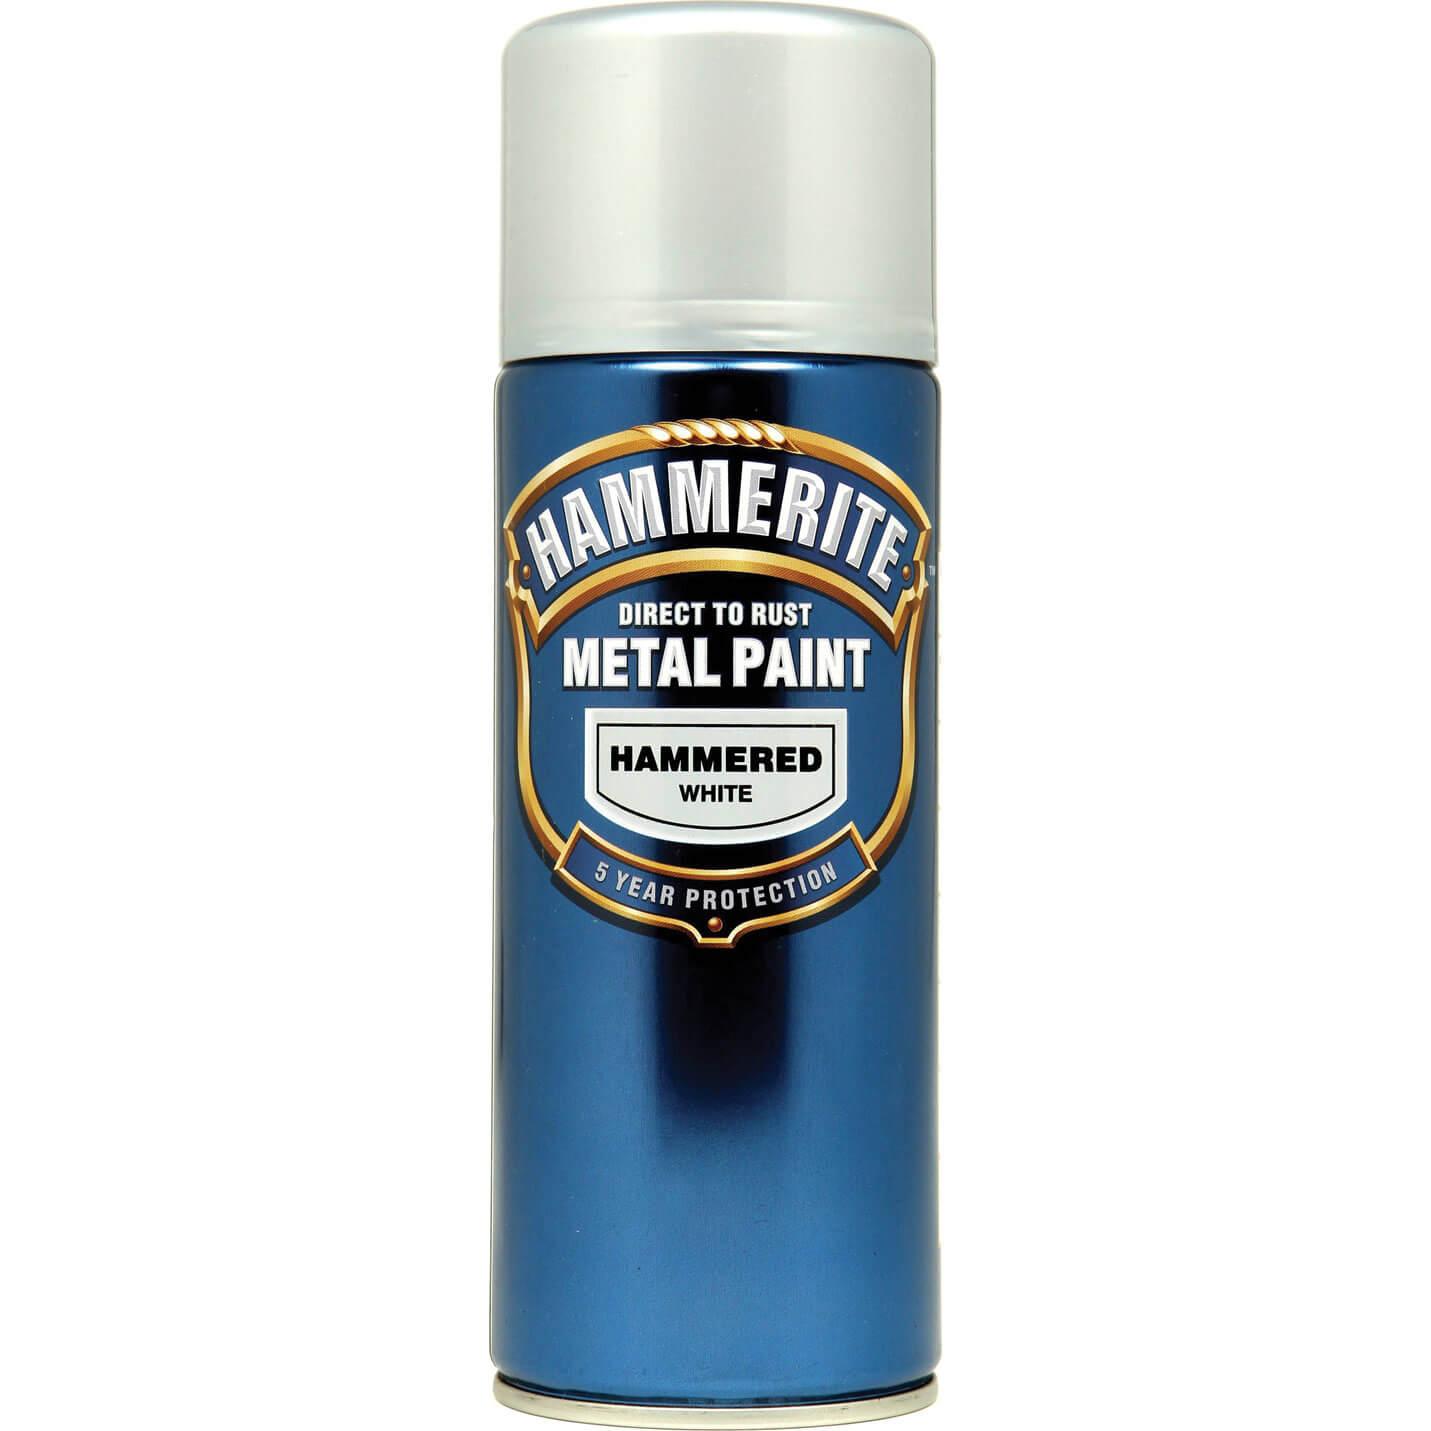 Image of Hammerite Hammered Finish Metal Paint Aerosol White 400ml